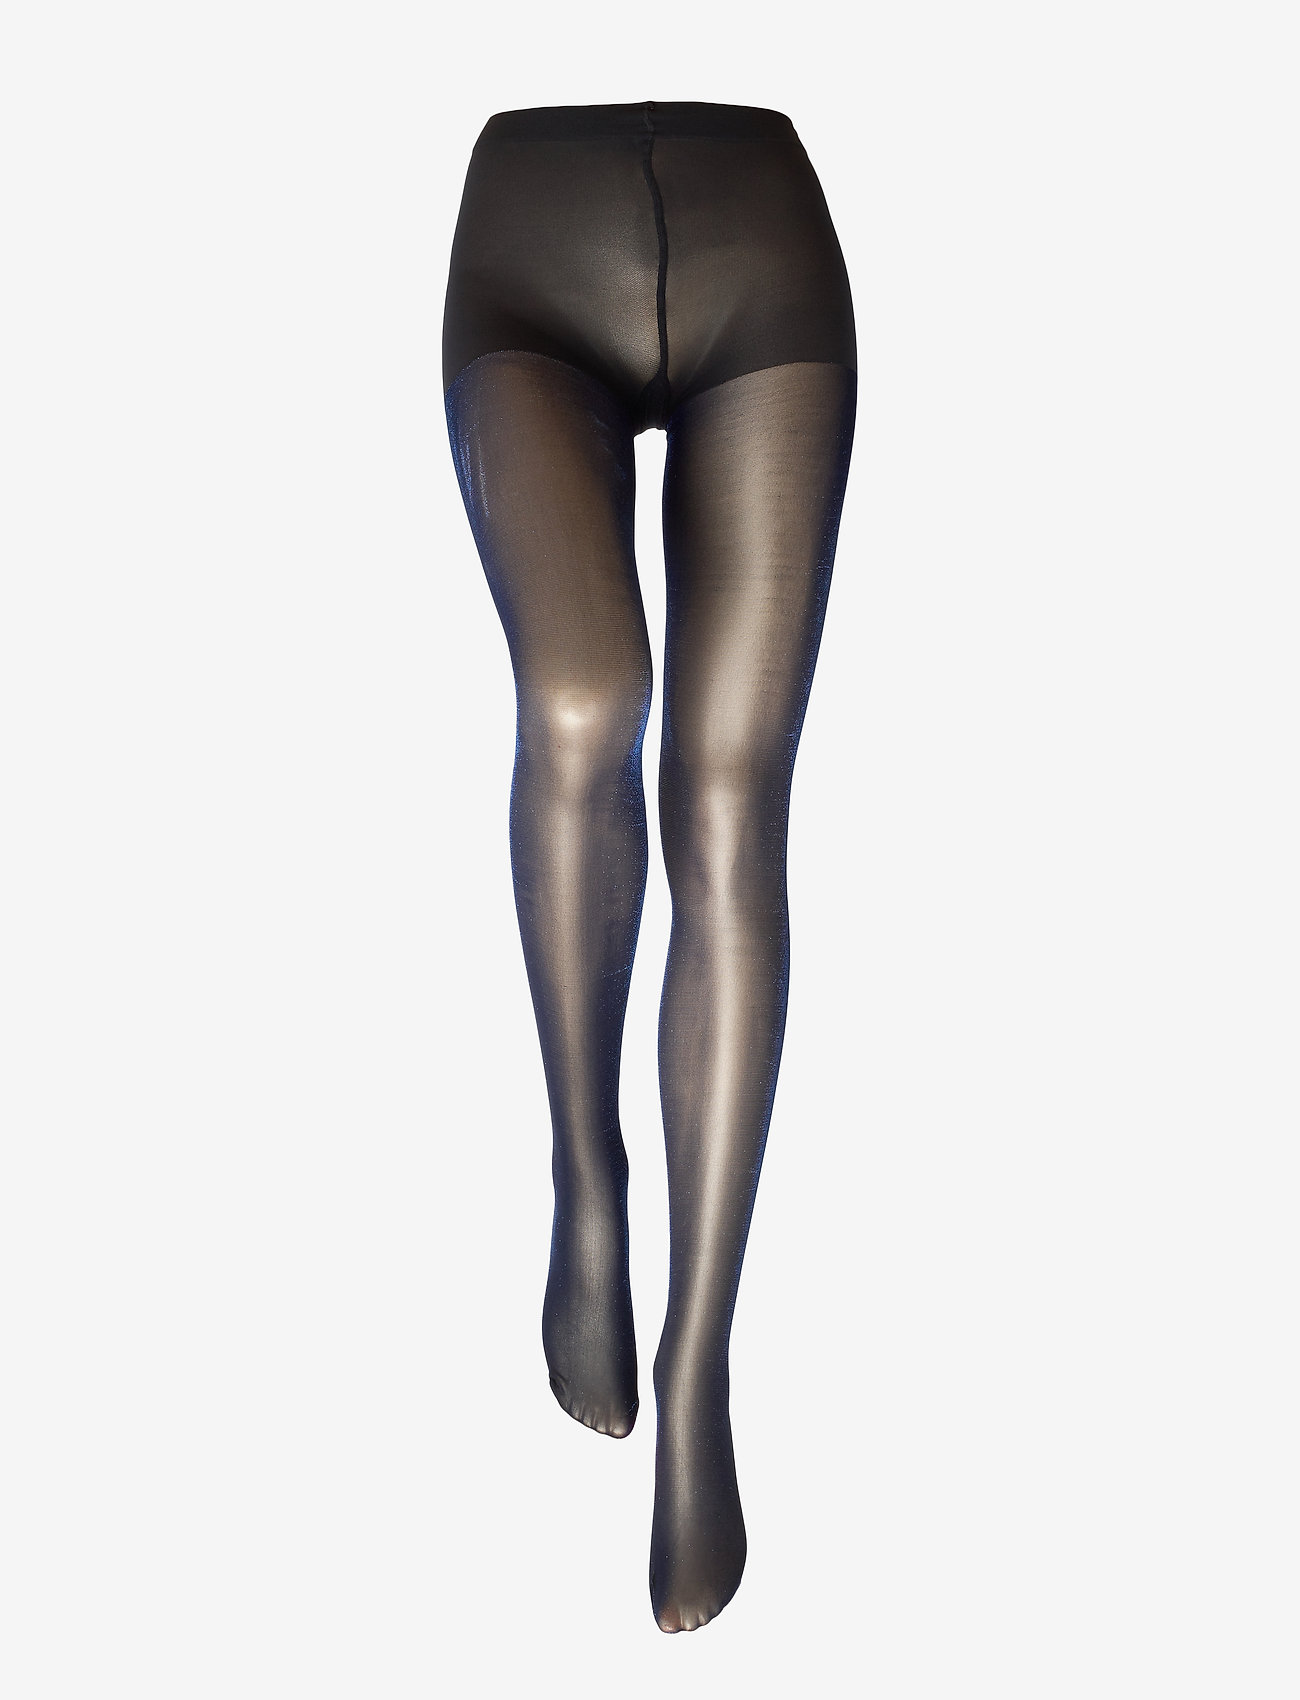 Vogue - Ladies pantyhose den, Roseline 40 - strømpebukser - black iris - 1